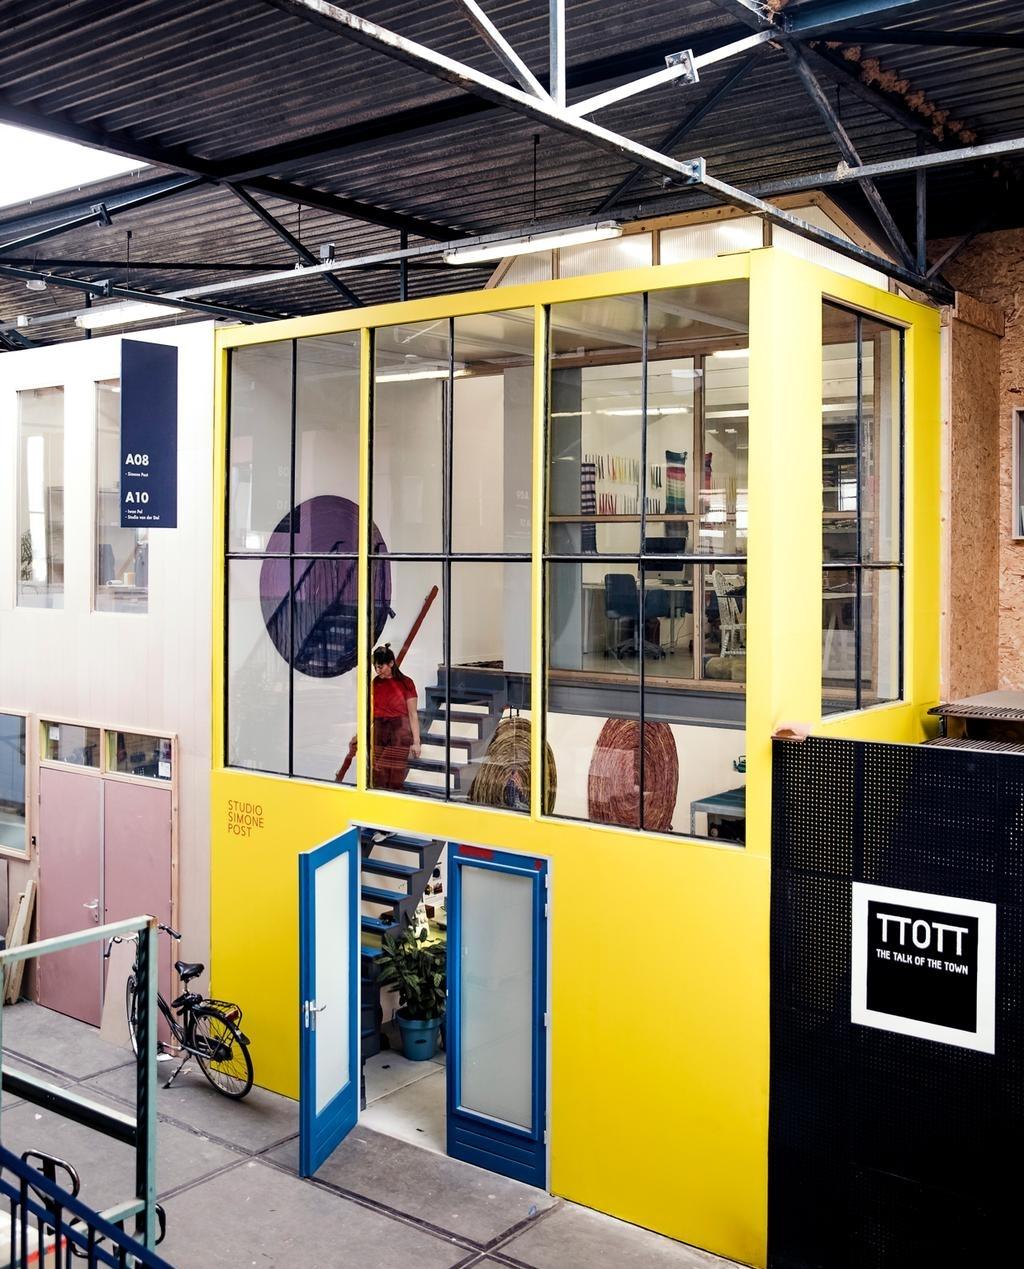 atelier simone post ((Foto: ernie enkelaar)) © rodi